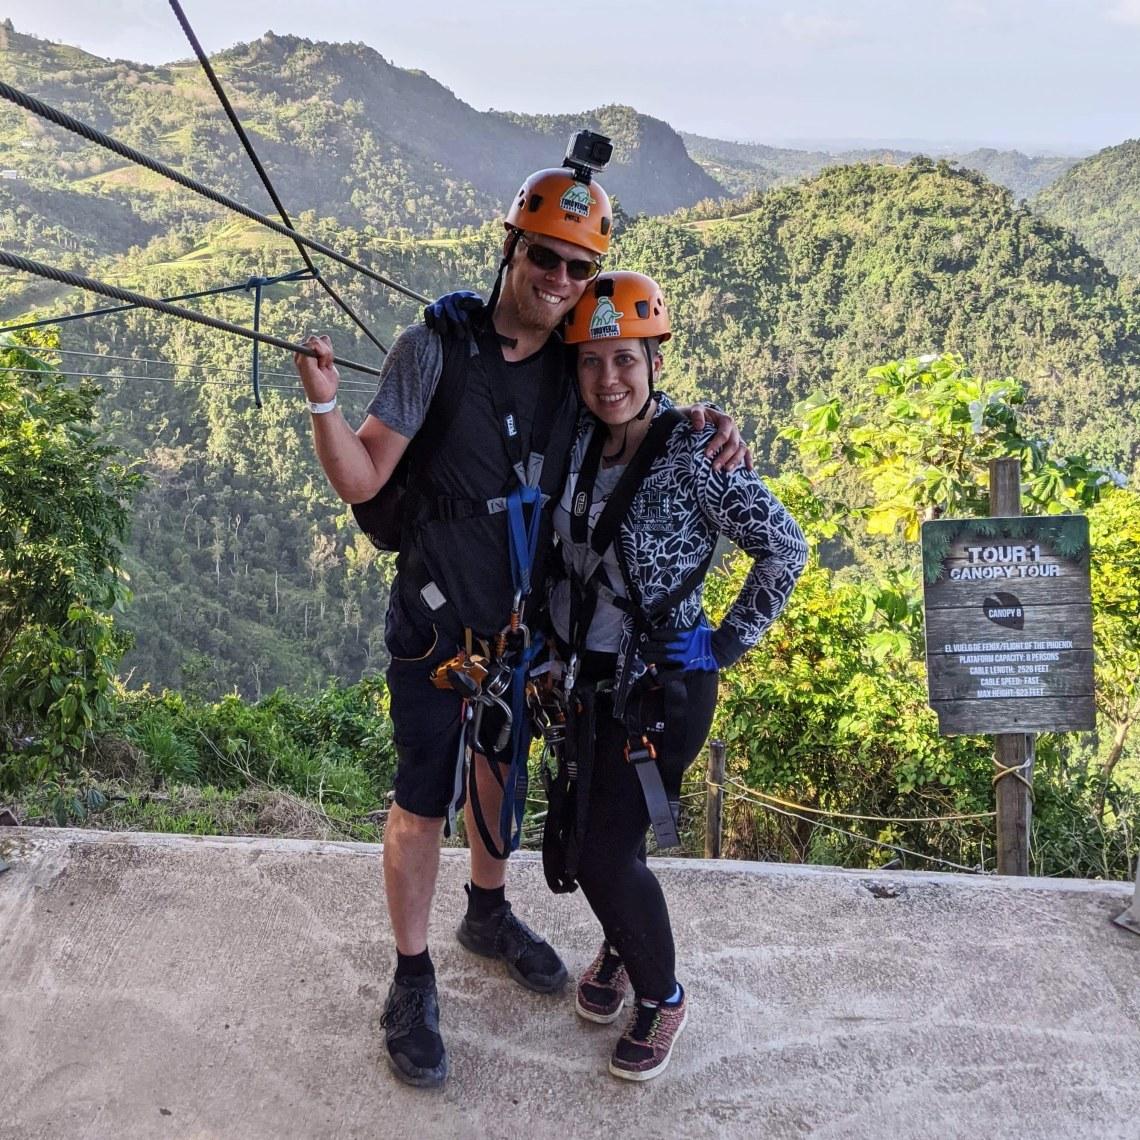 Toroverde, Toroverde, Puerto Rico: $99 Zip Line Day Pass, The Travel Bug Bite